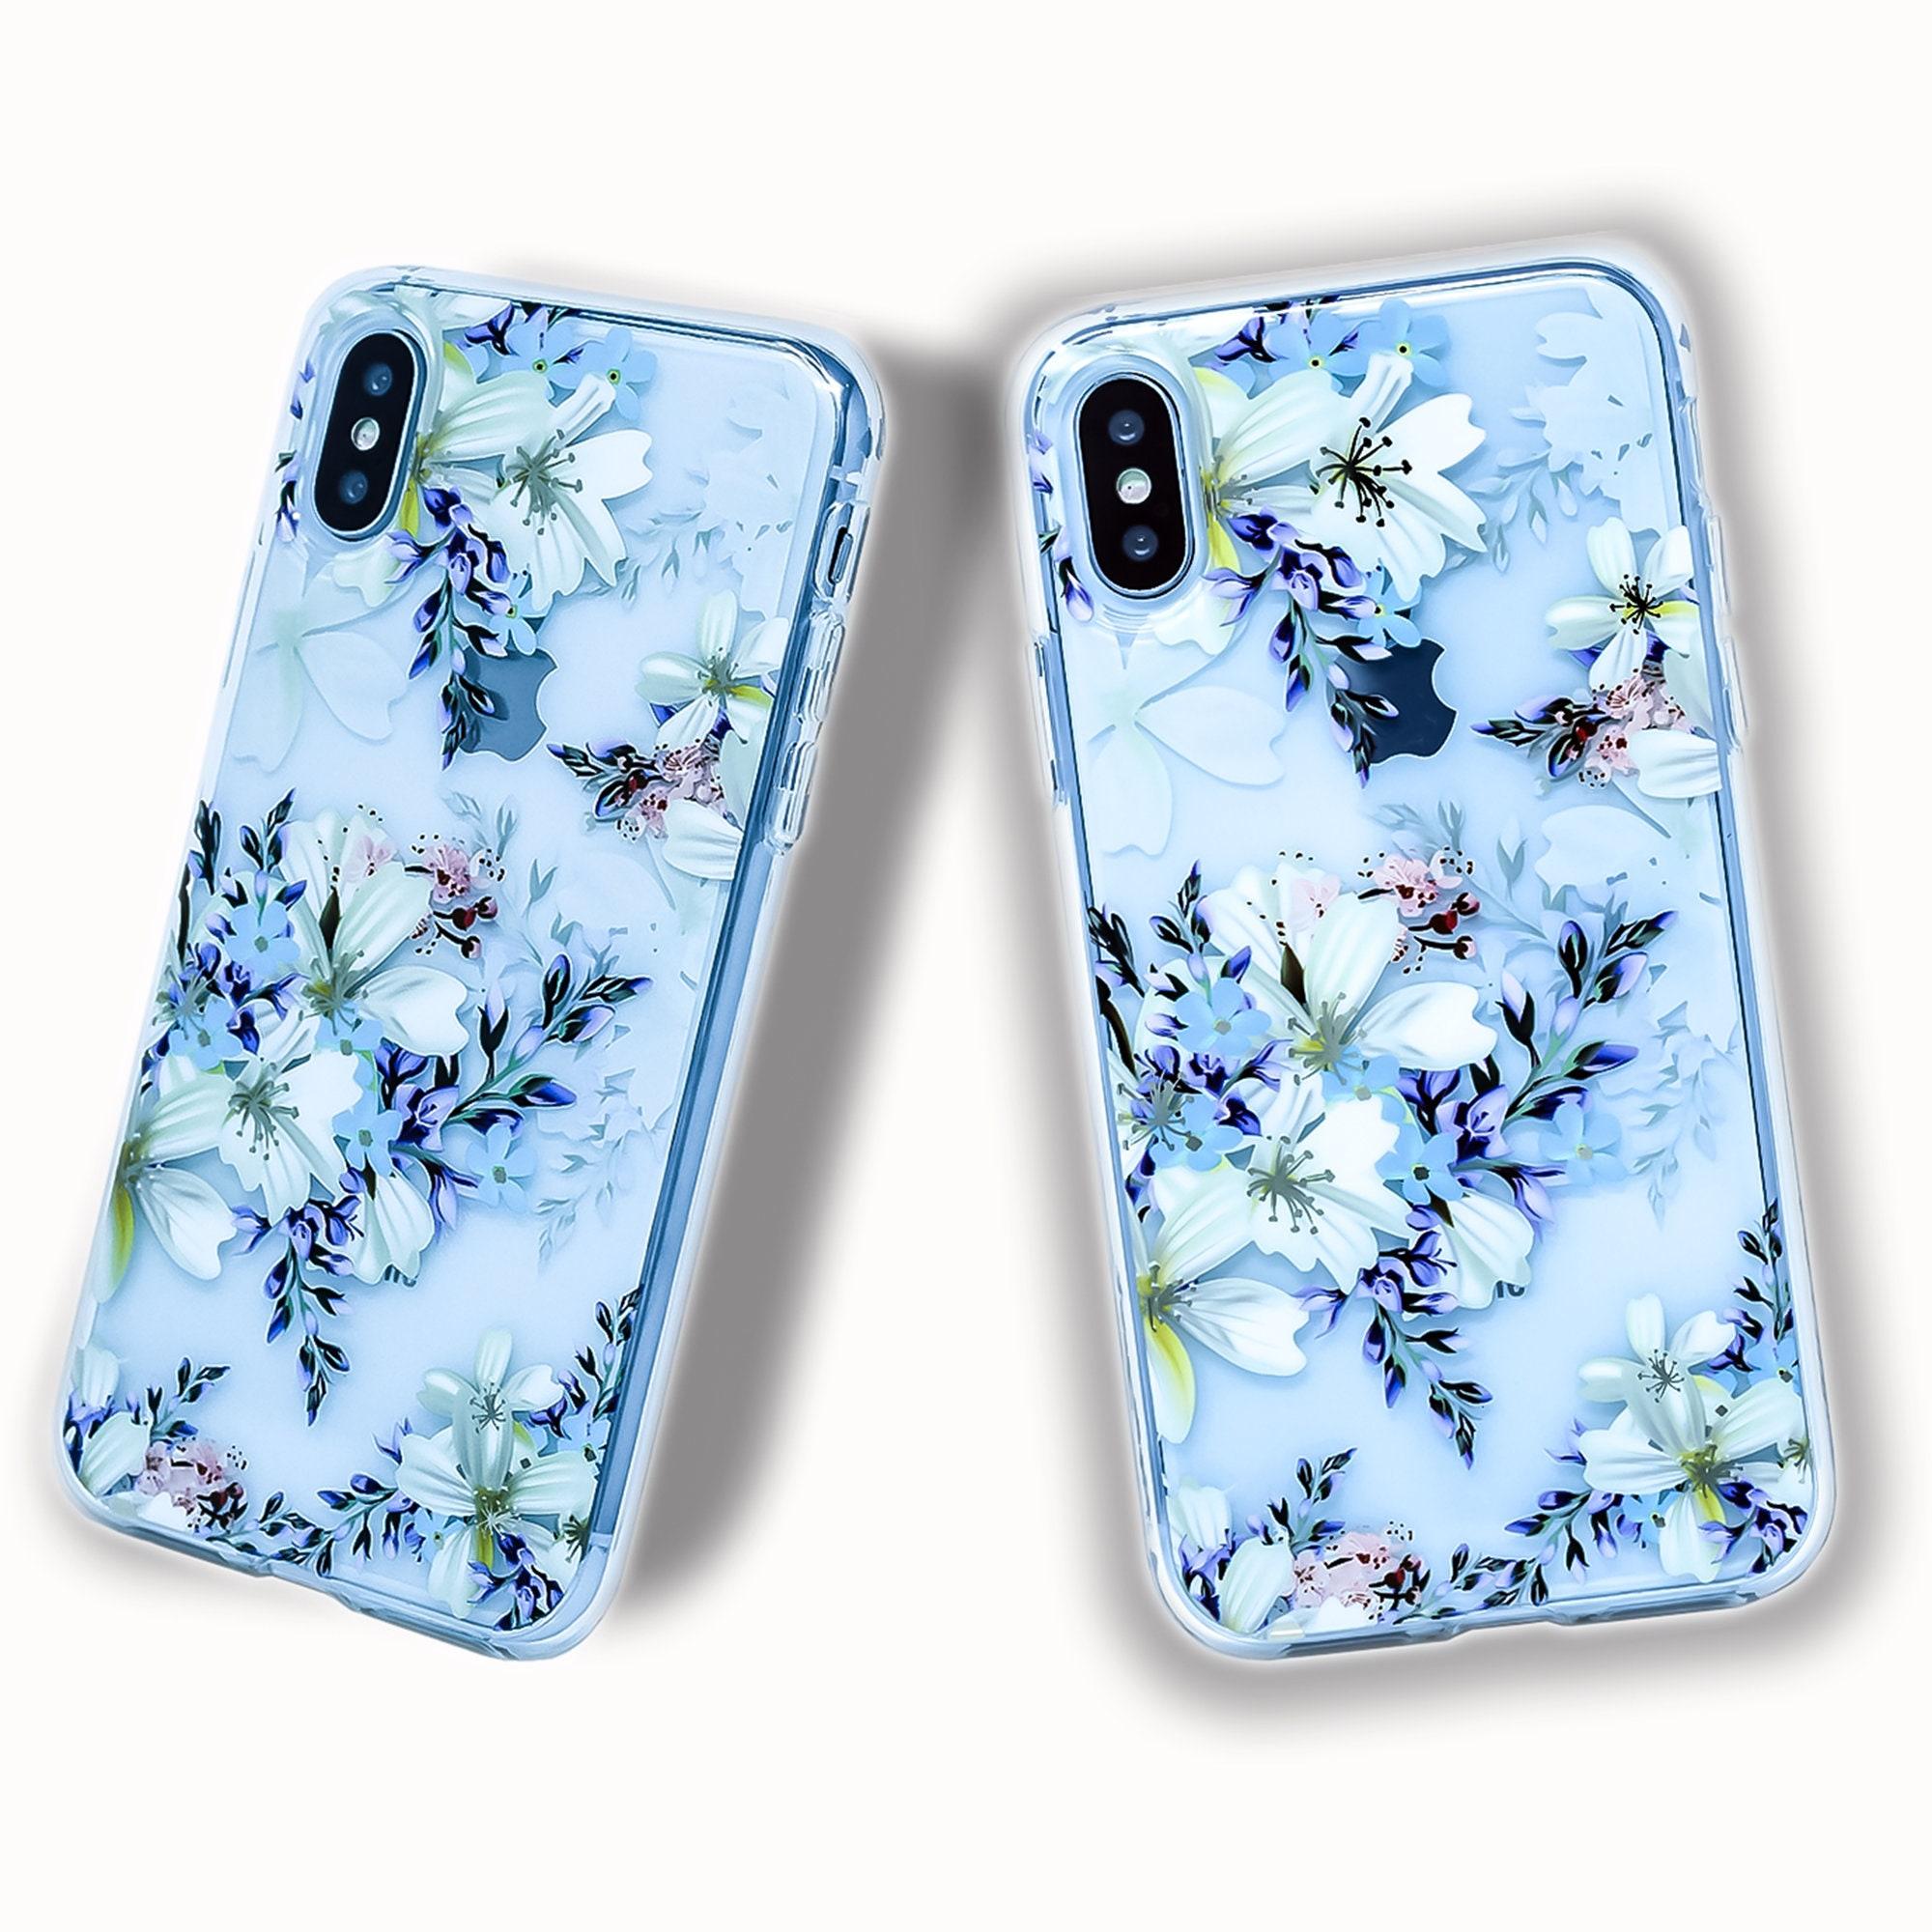 Clear Floral Iphone Case Floral Iphone 7 Case Floral Iphone Etsy